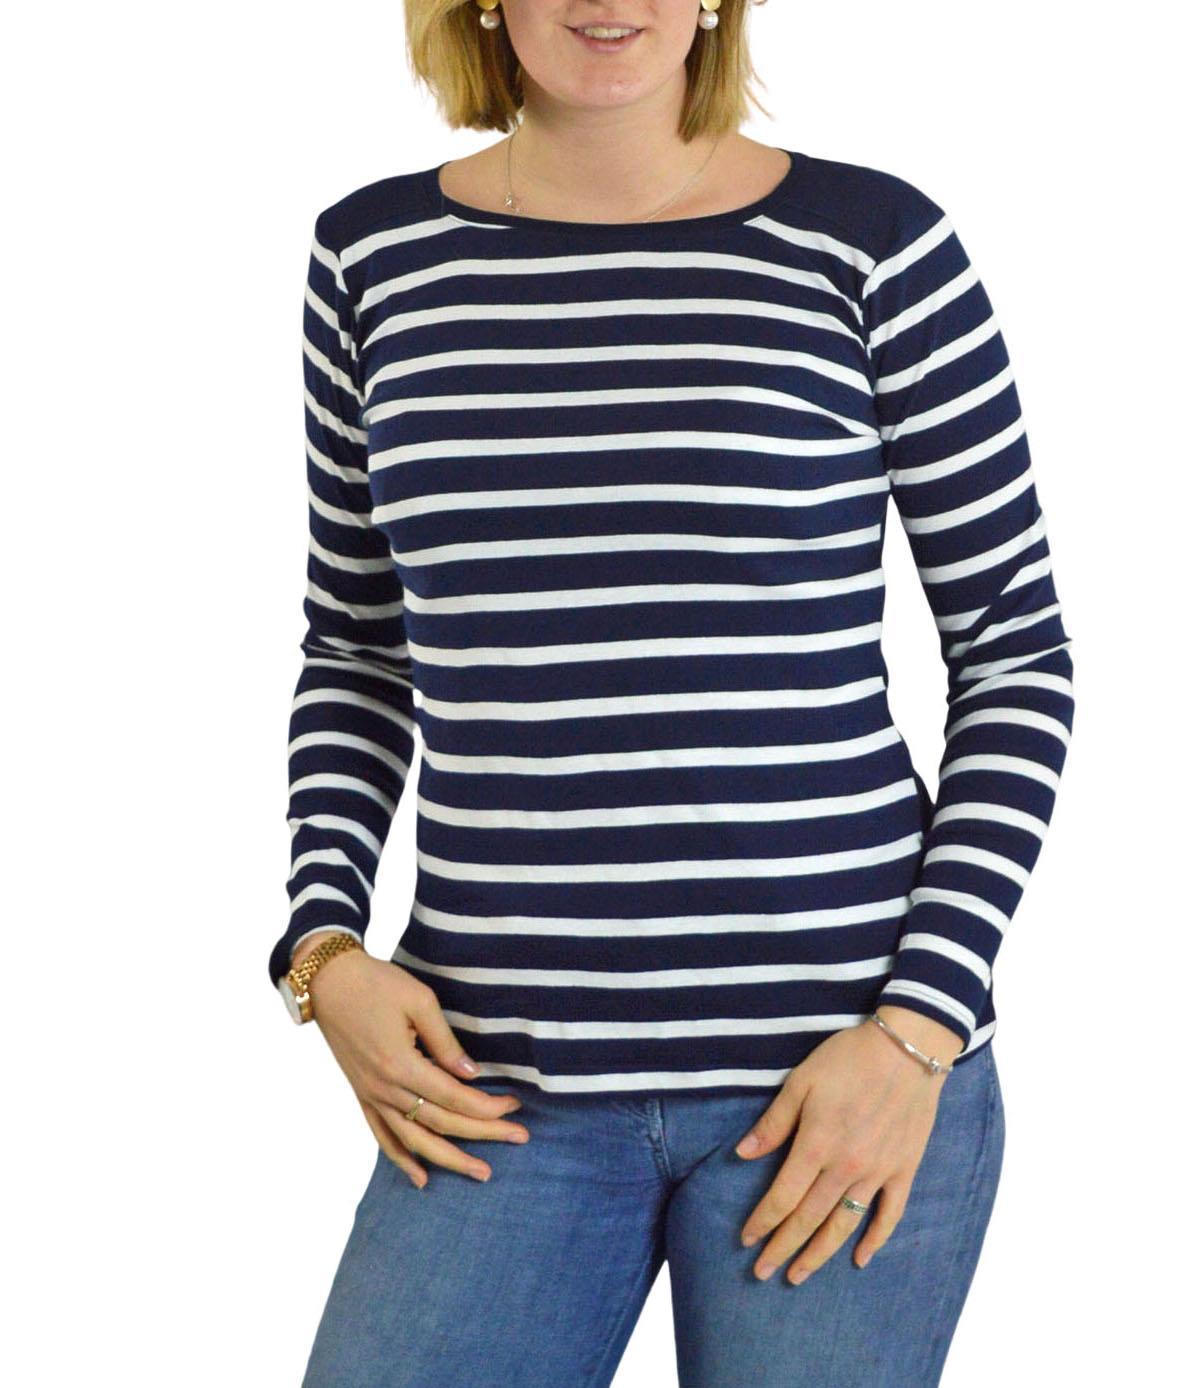 Femmes-noir-ou-bleu-marine-rayure-blanche-a-manches-longues-T-Shirt-Top miniature 9